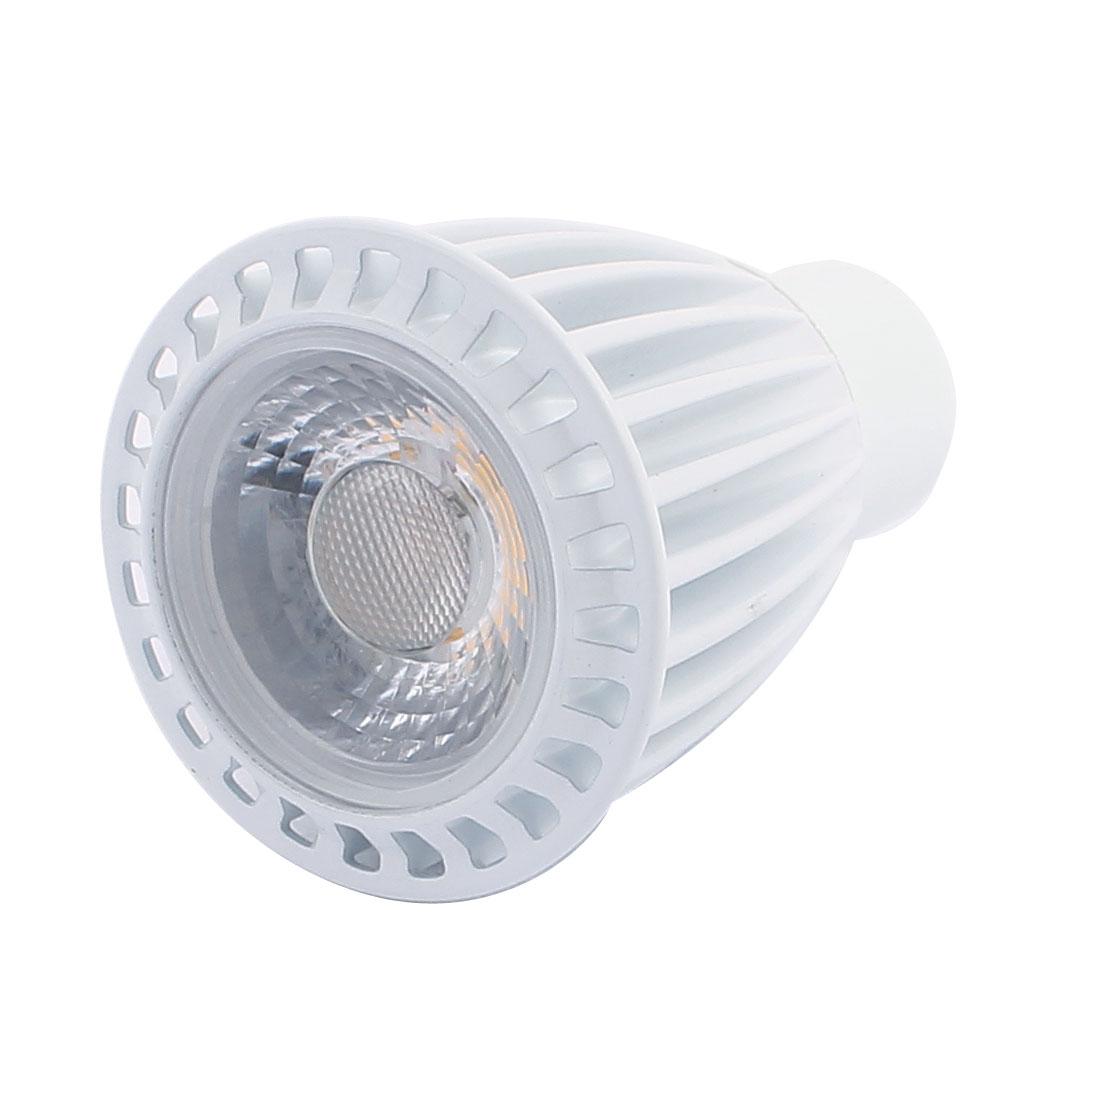 AC85-265V 7W GU5.3 COB Integrated Chip LED Spotlight Lamp Bulb Downlight Warm White